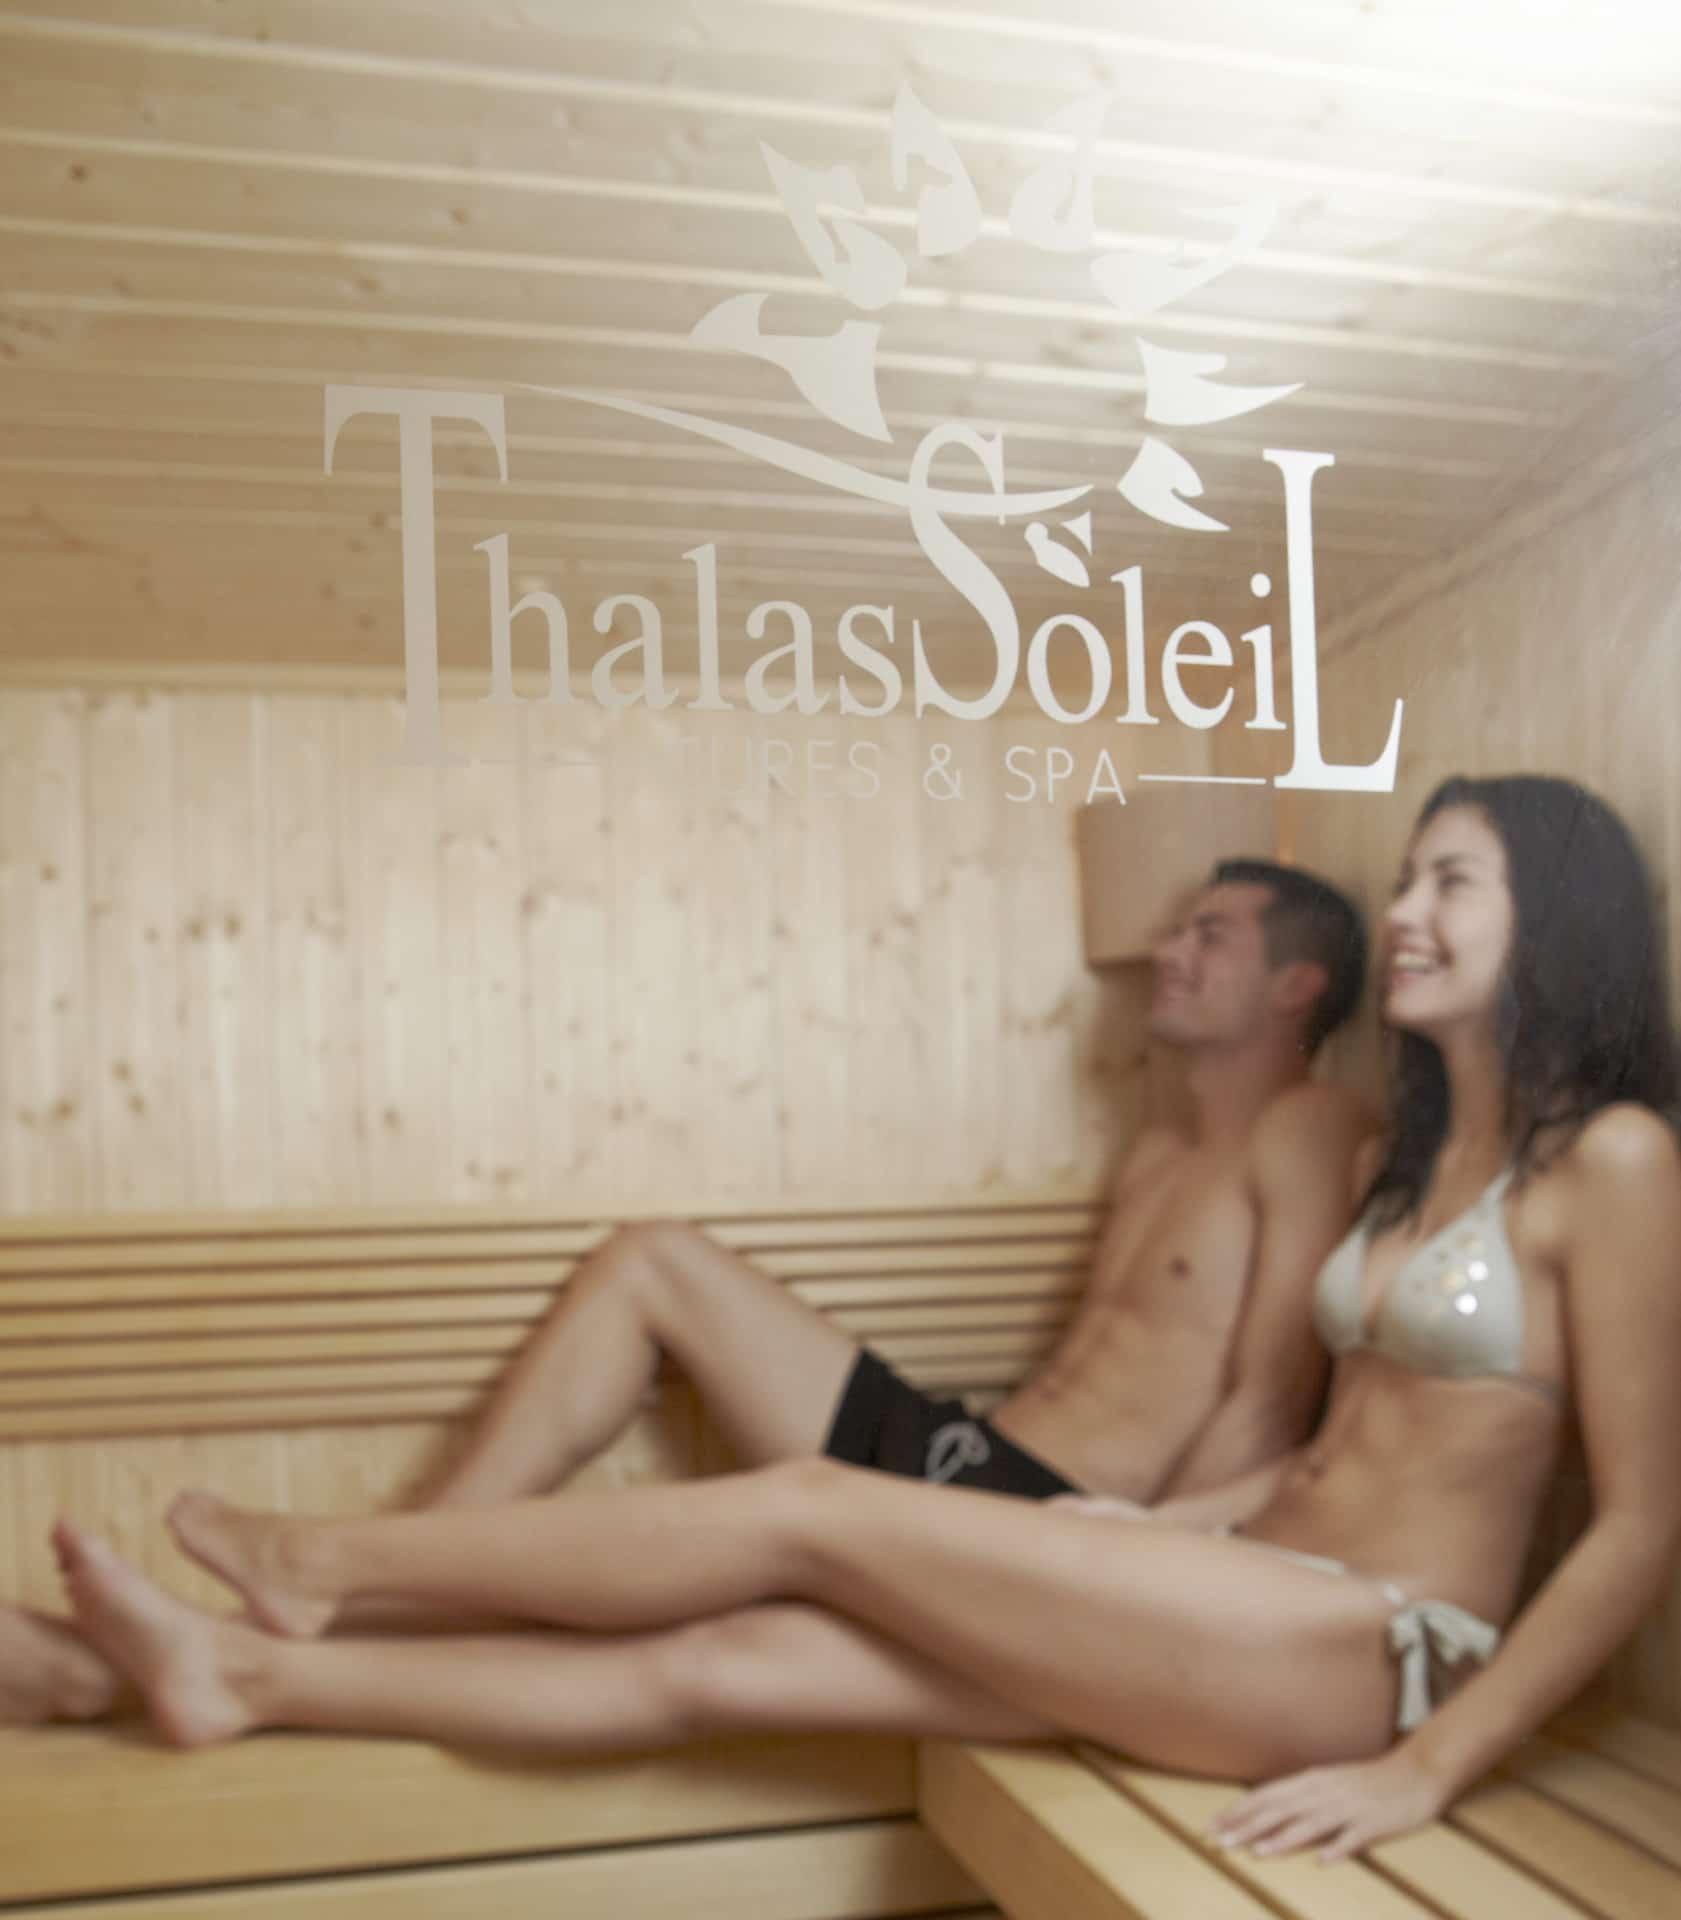 Sauna Thalassoleil